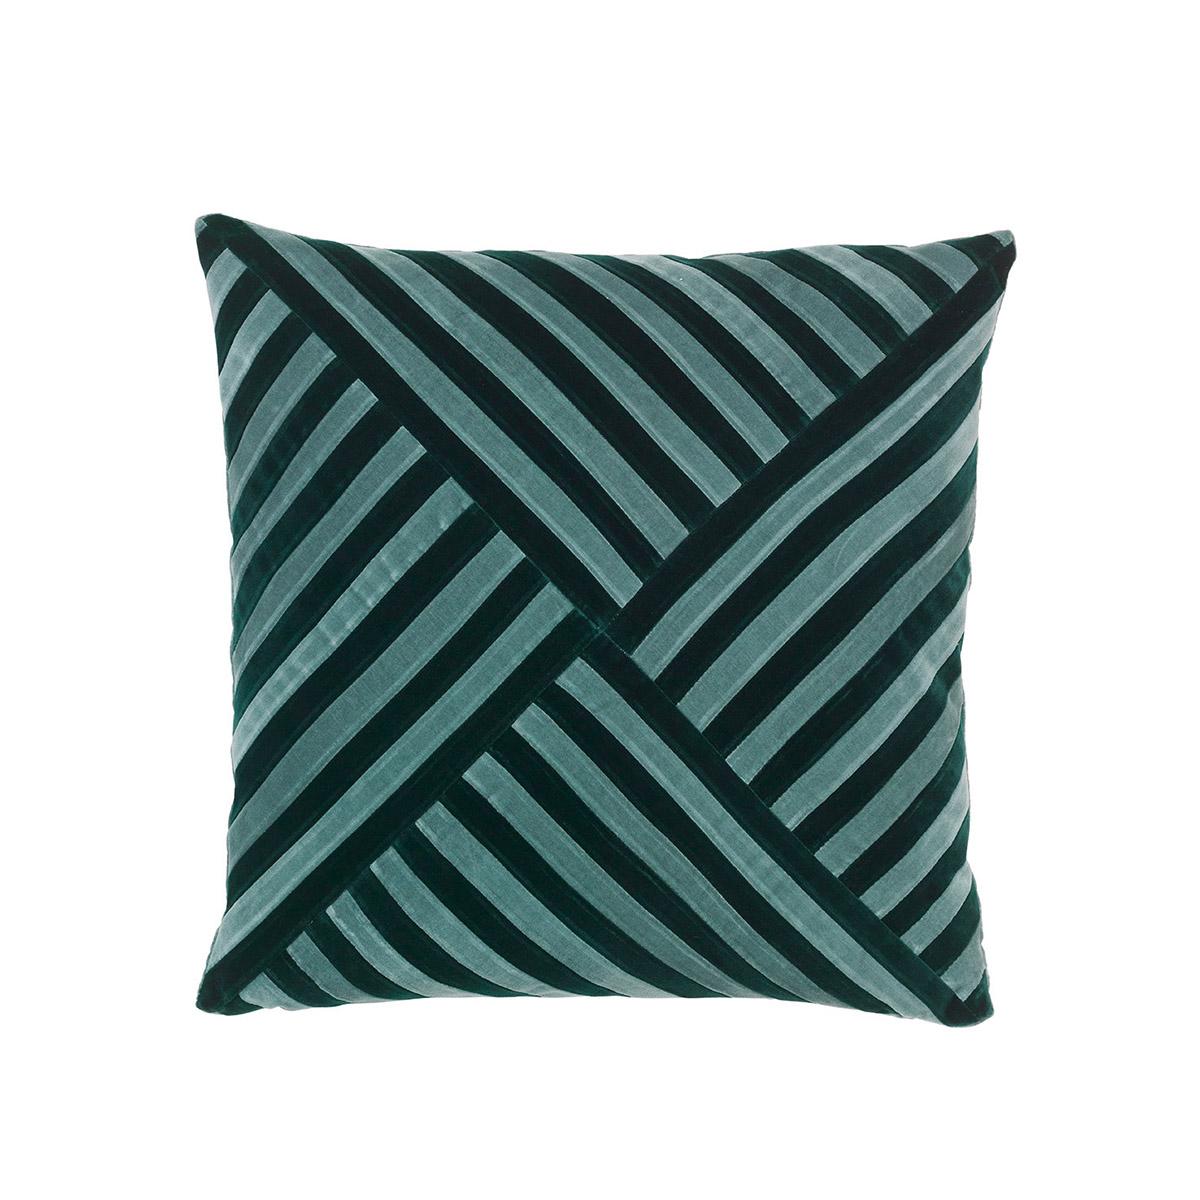 55x55 Lily Pale Blue/Emerald